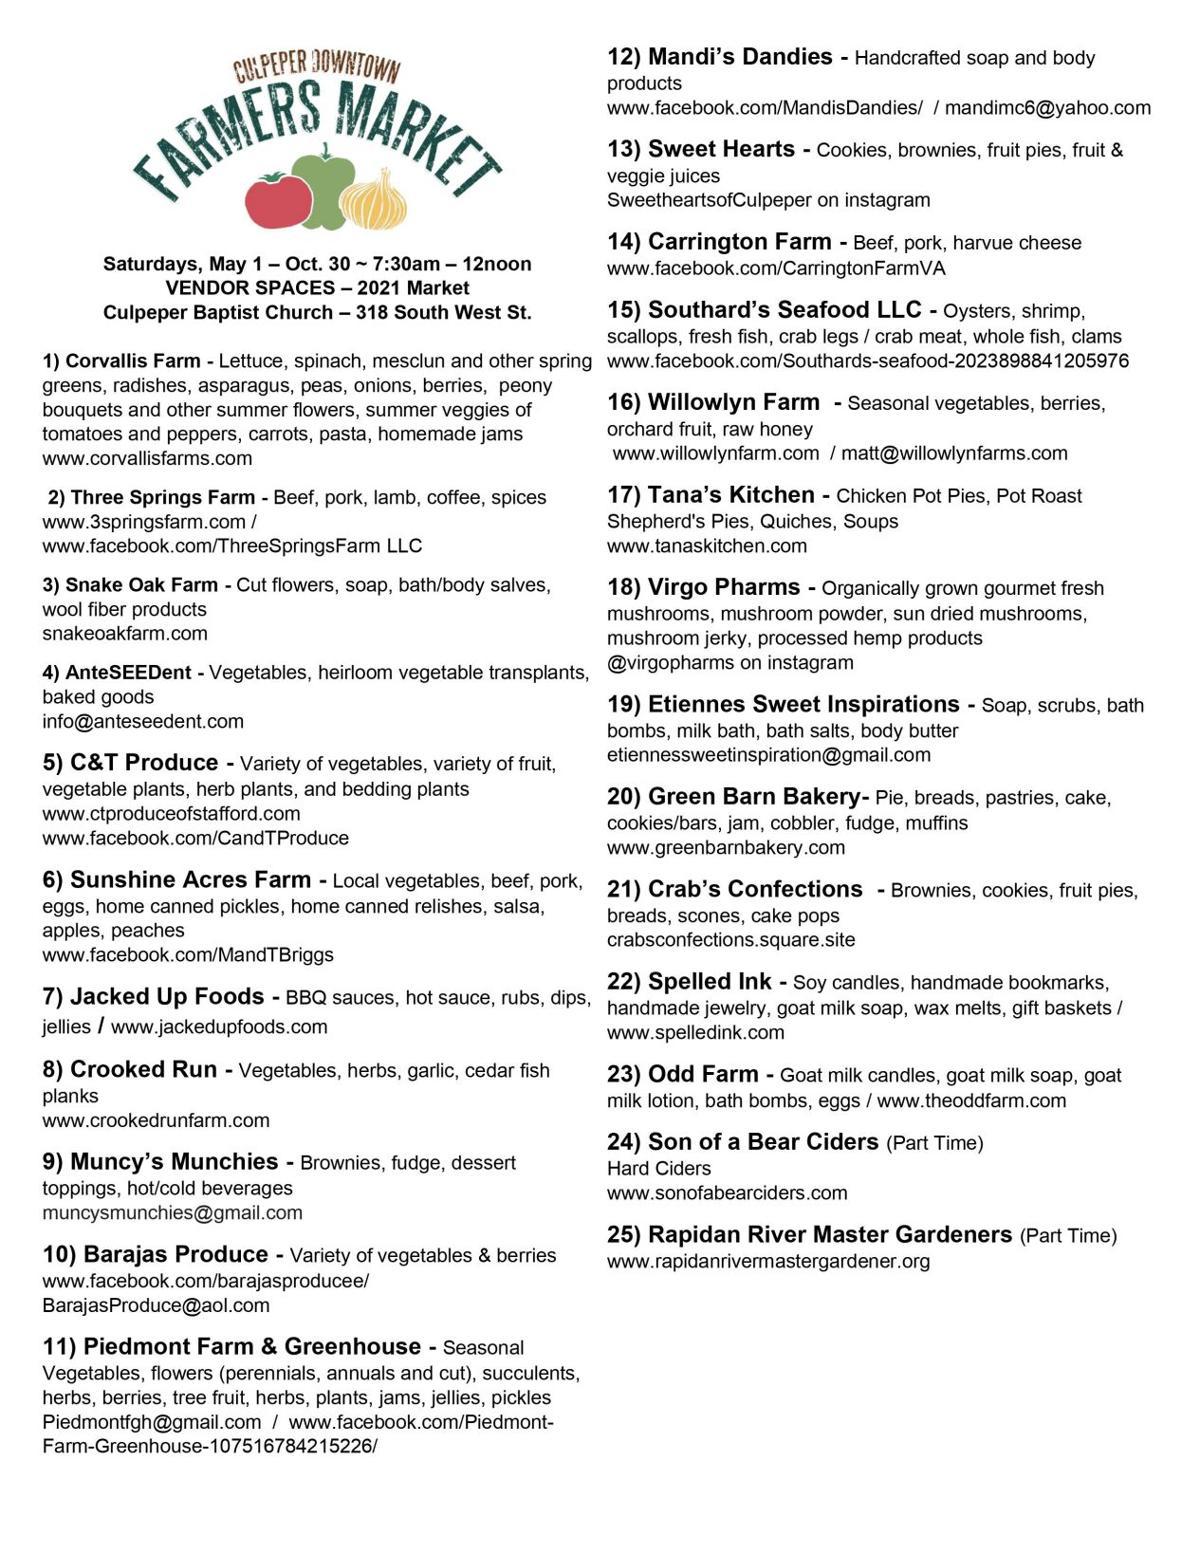 farmers market vendors list